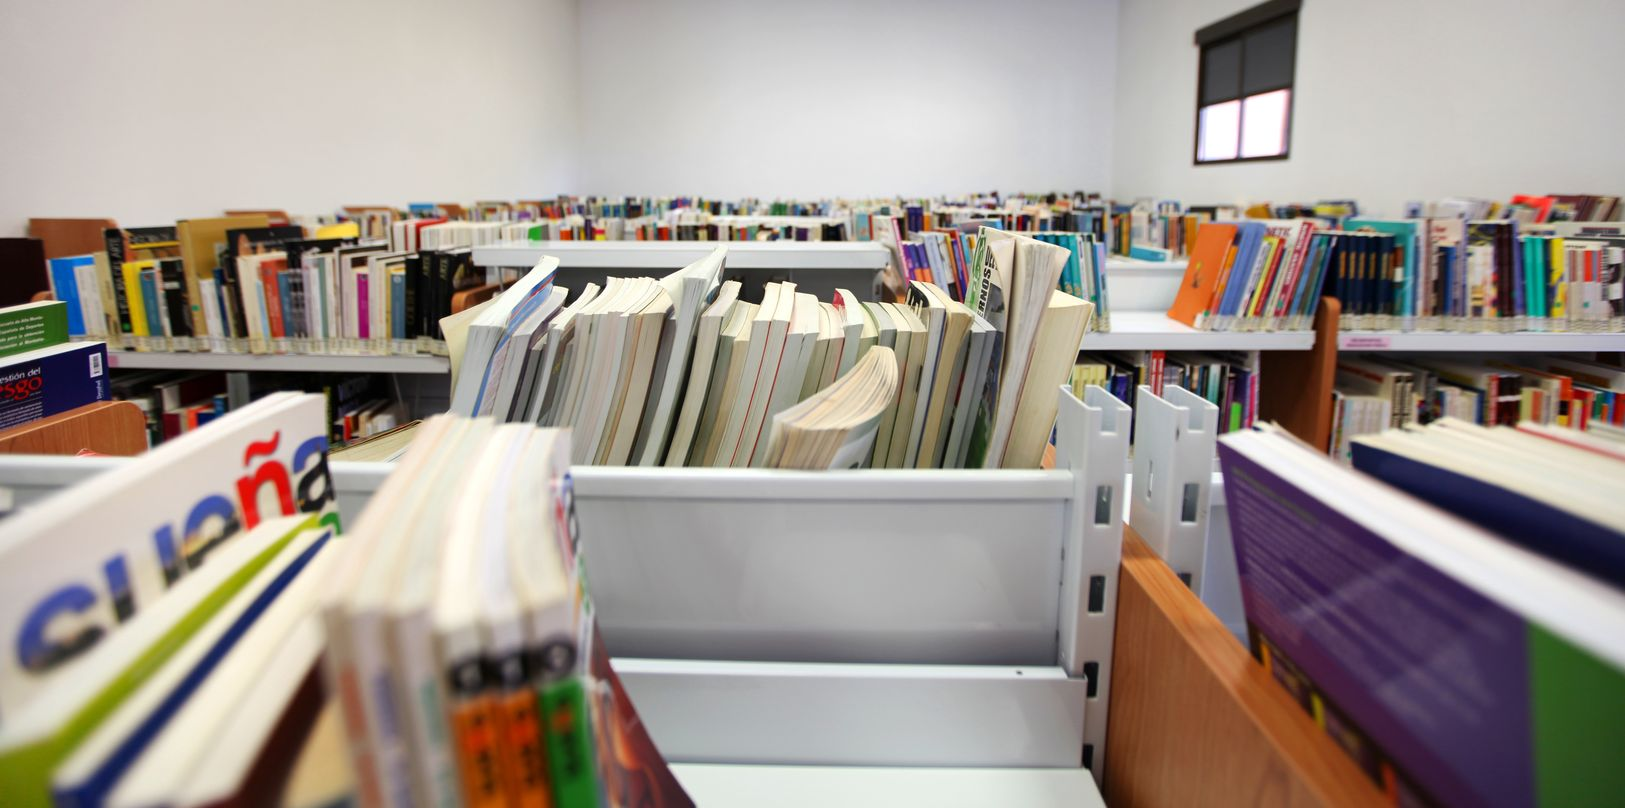 Libros Biblioteca_result.jpg